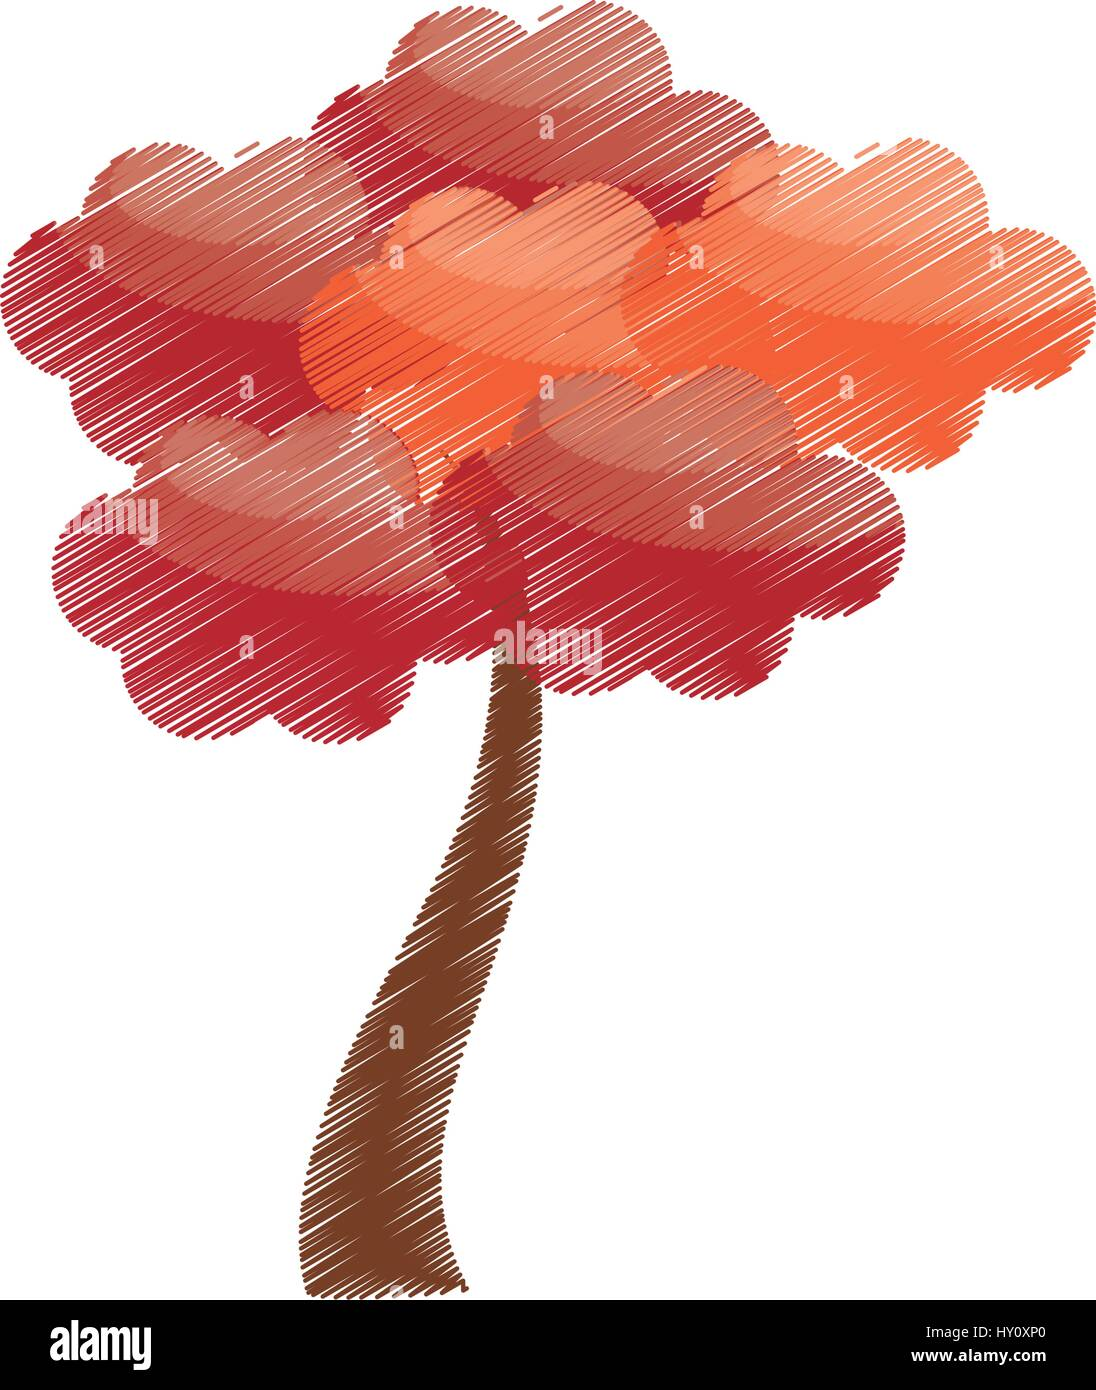 Arbre Sakura Dessin Japon Image Vectorielle Stock Alamy